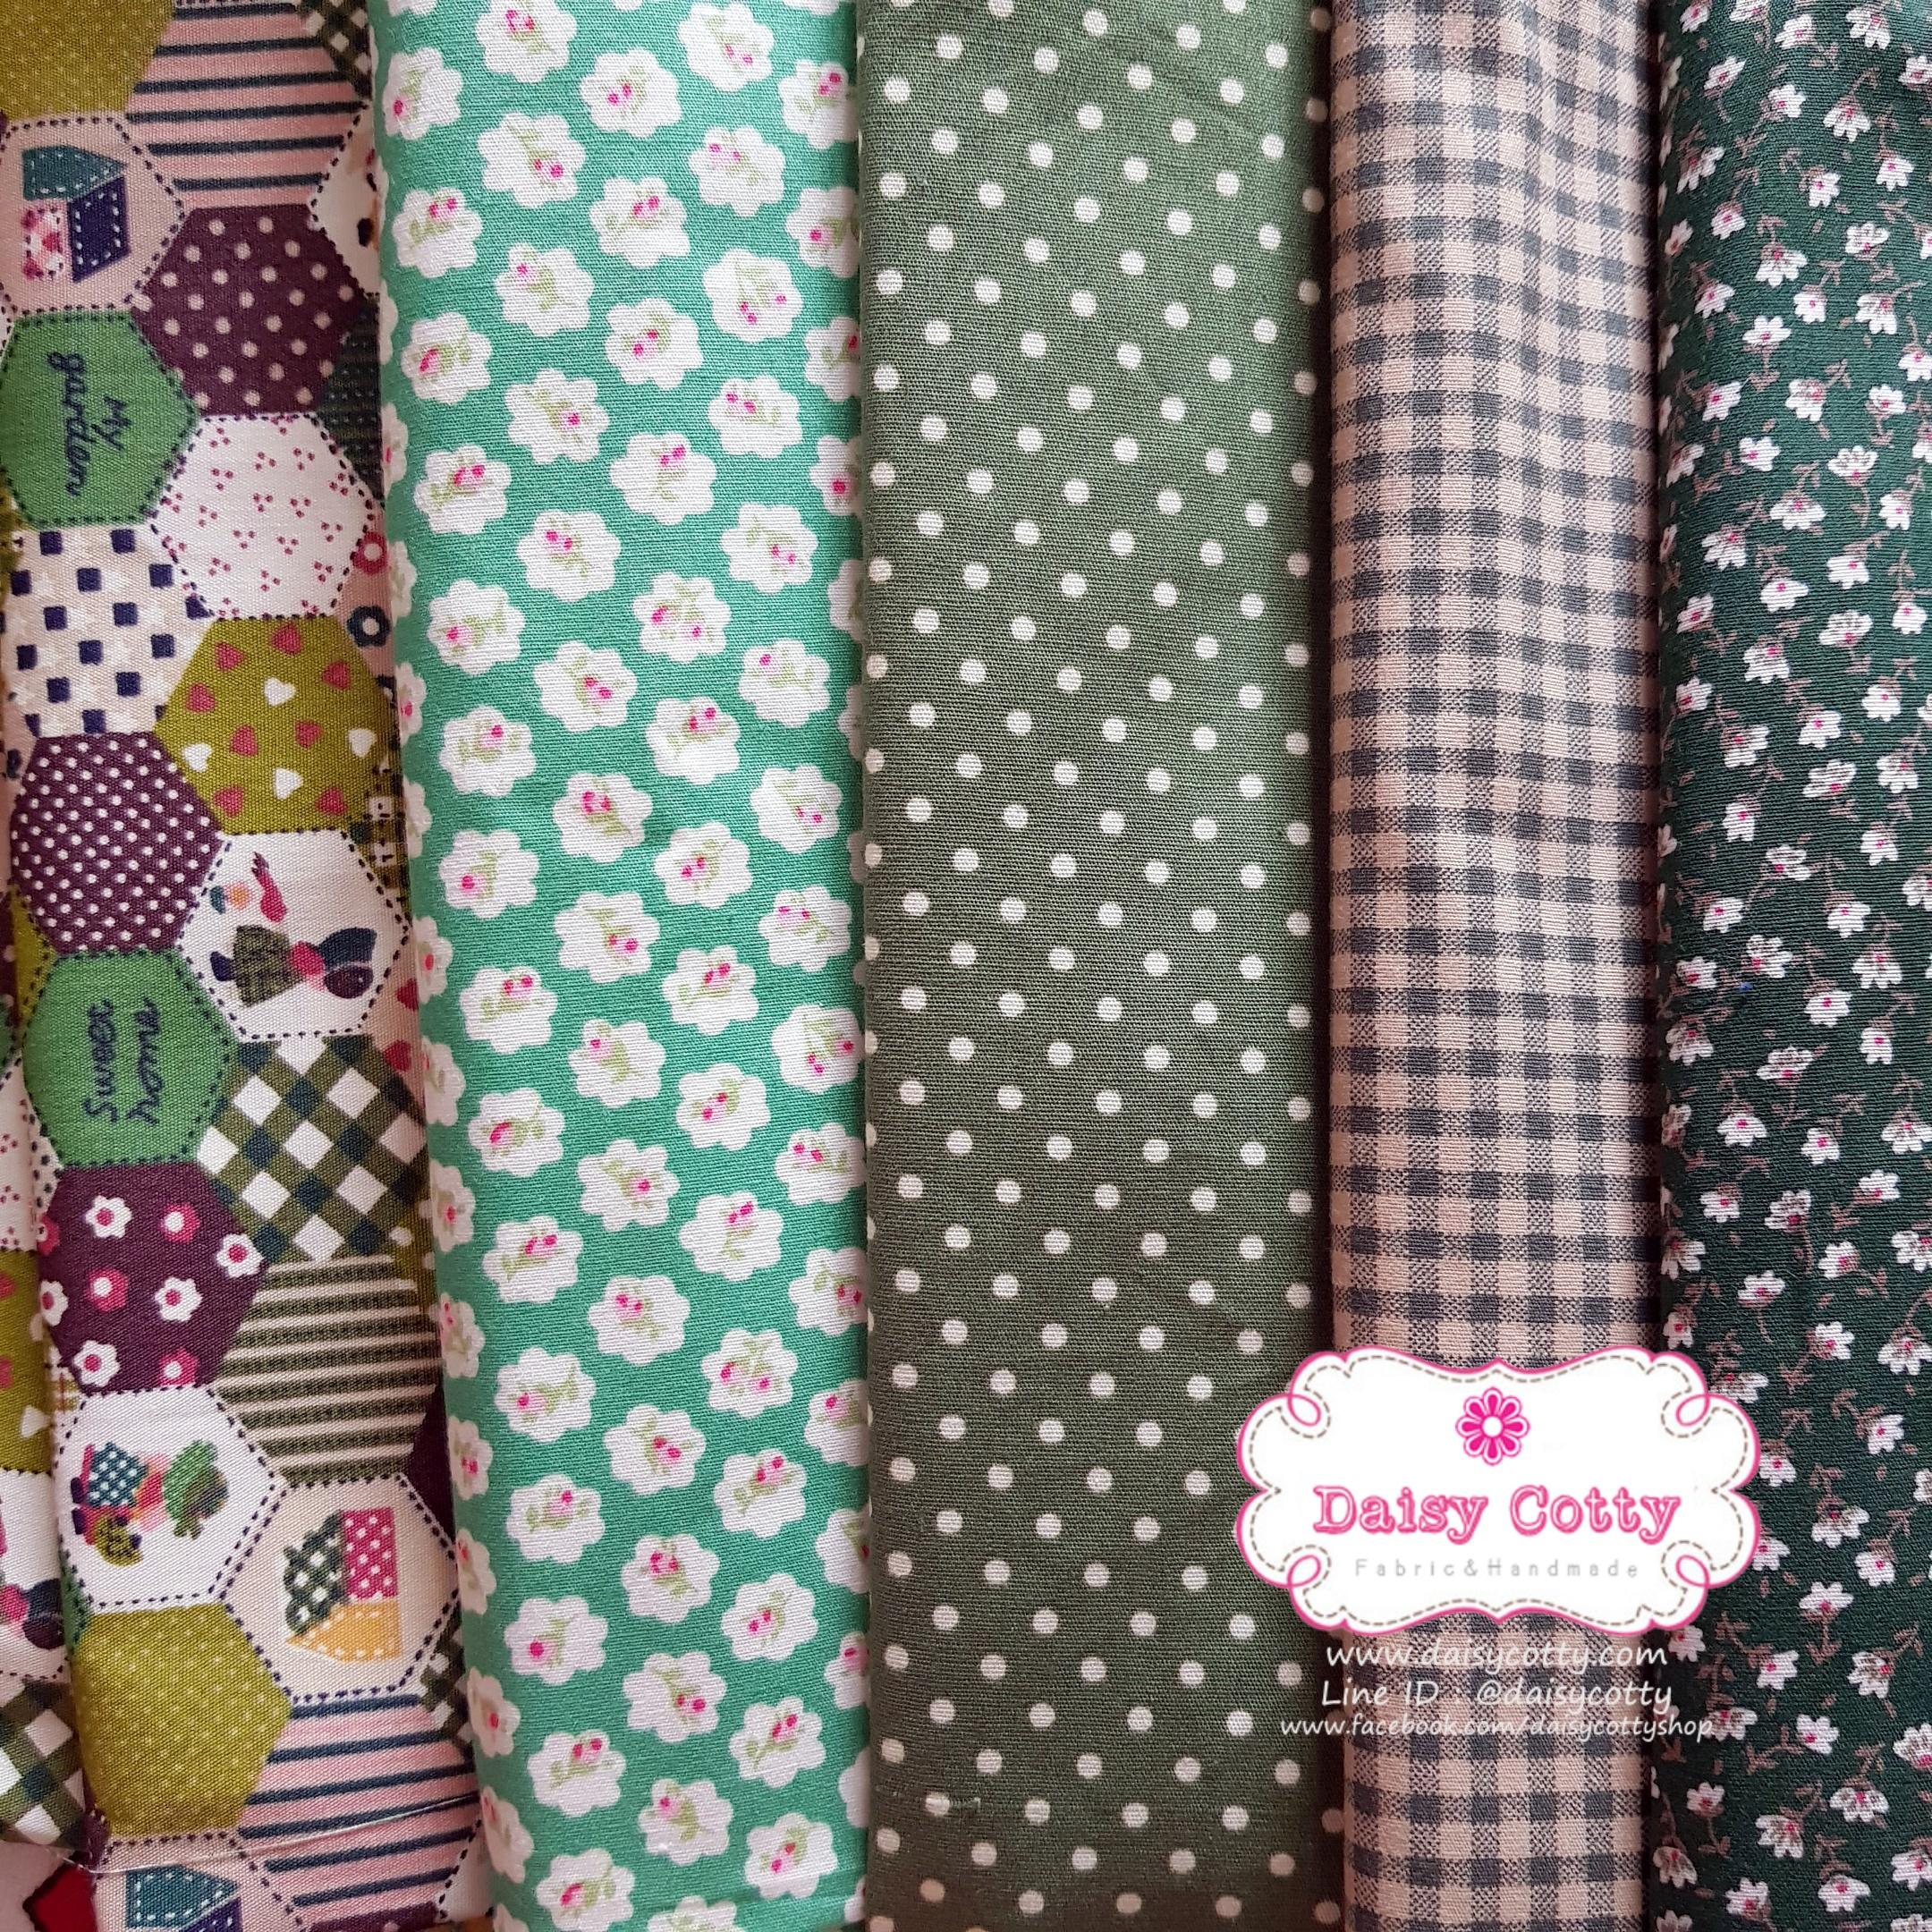 Set 5 ชิ้น : ผ้าคอตตอน100% โทนสีเขียว 5 ลาย แต่ละชิ้นขนาด1/8 ม.(50x27.5ซม.)